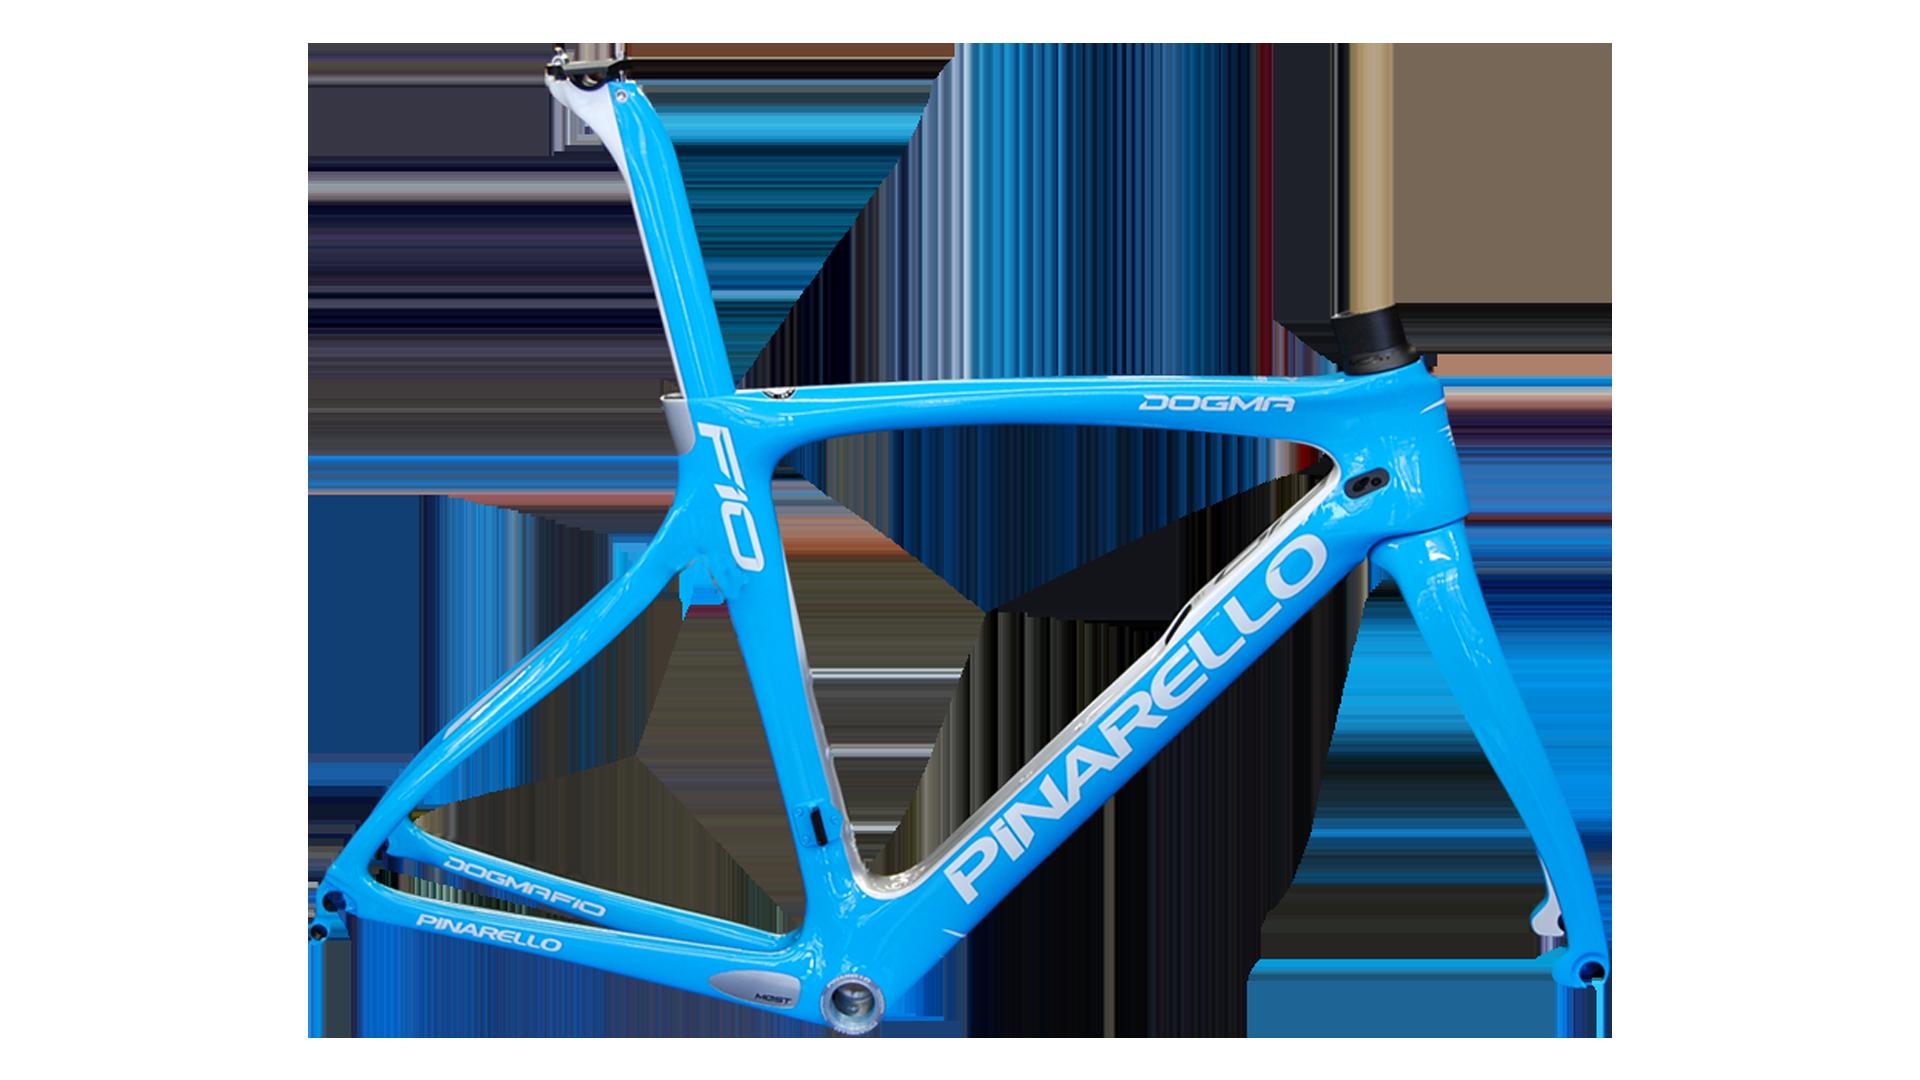 pinarello Pinarello Dogma f10 frame (Diamond Blue) non disc